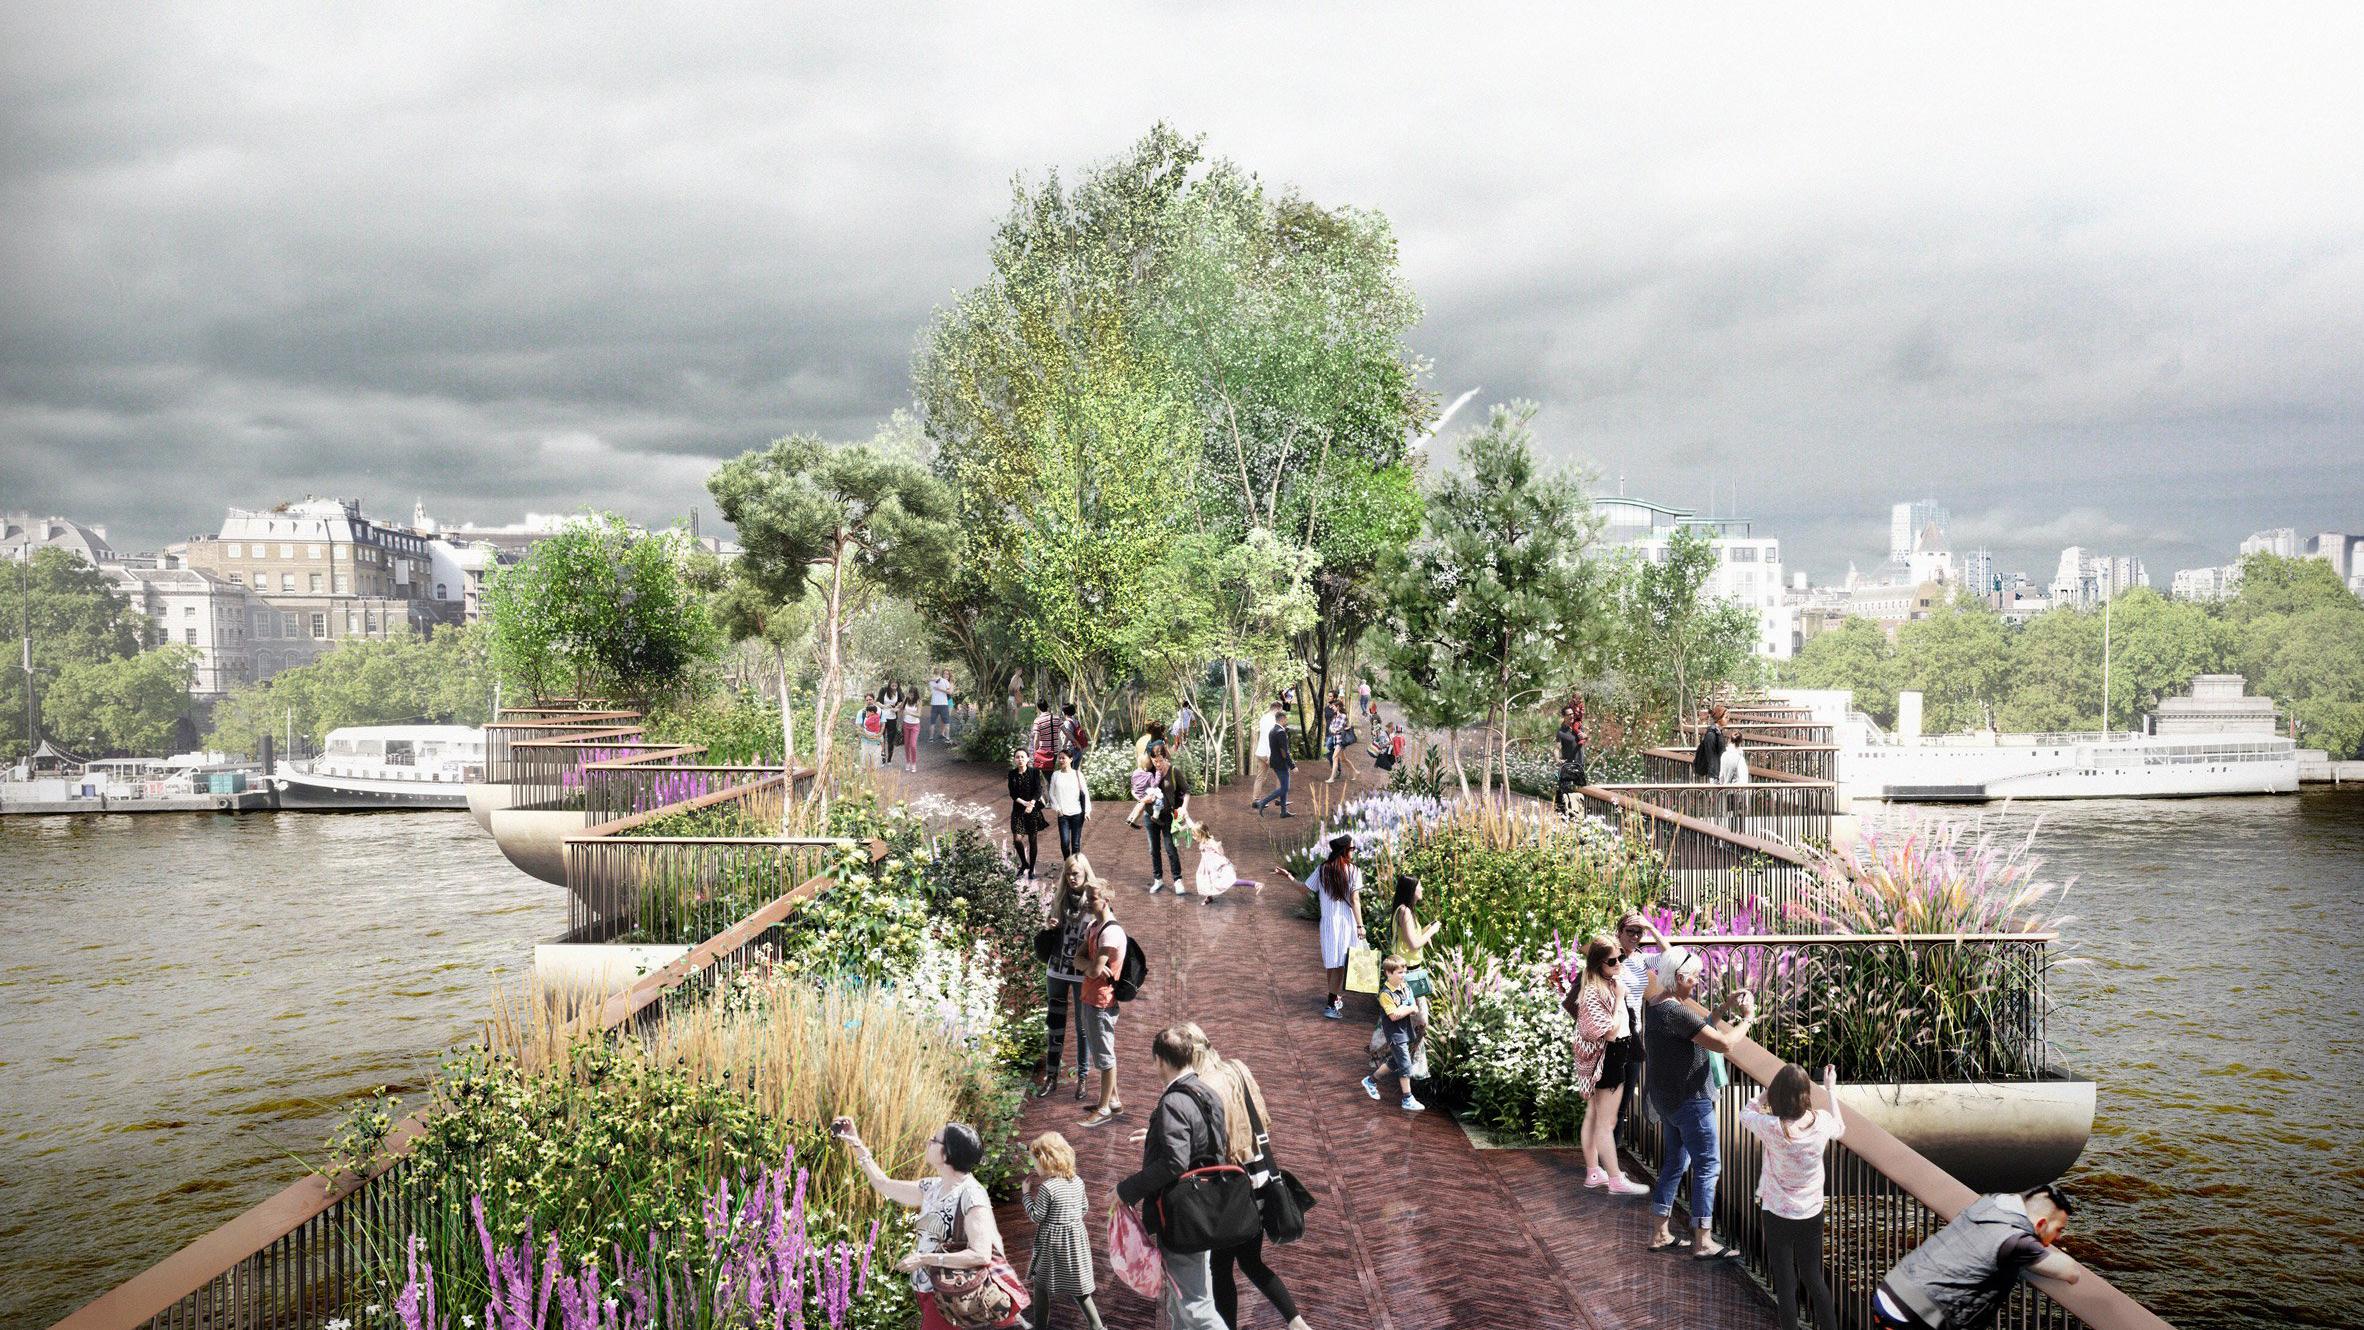 Apple store was proposed for Garden Bridge in return for sponsorship